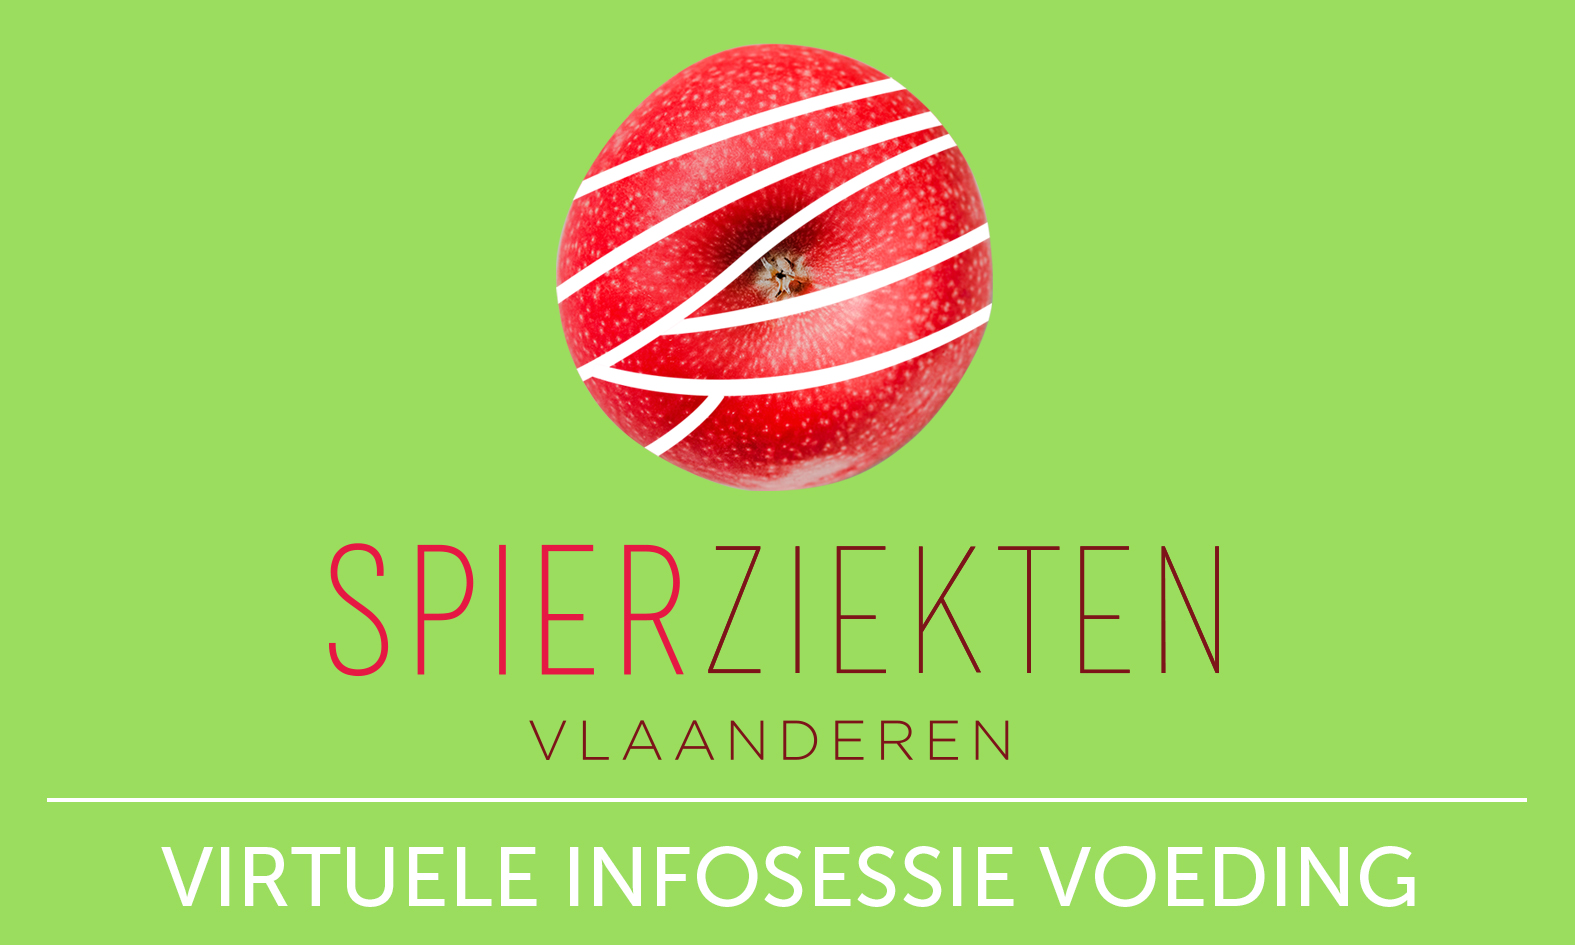 INFOSESSIE-voeding-an_vision-0ySmdv7Eek0-unsplash Home